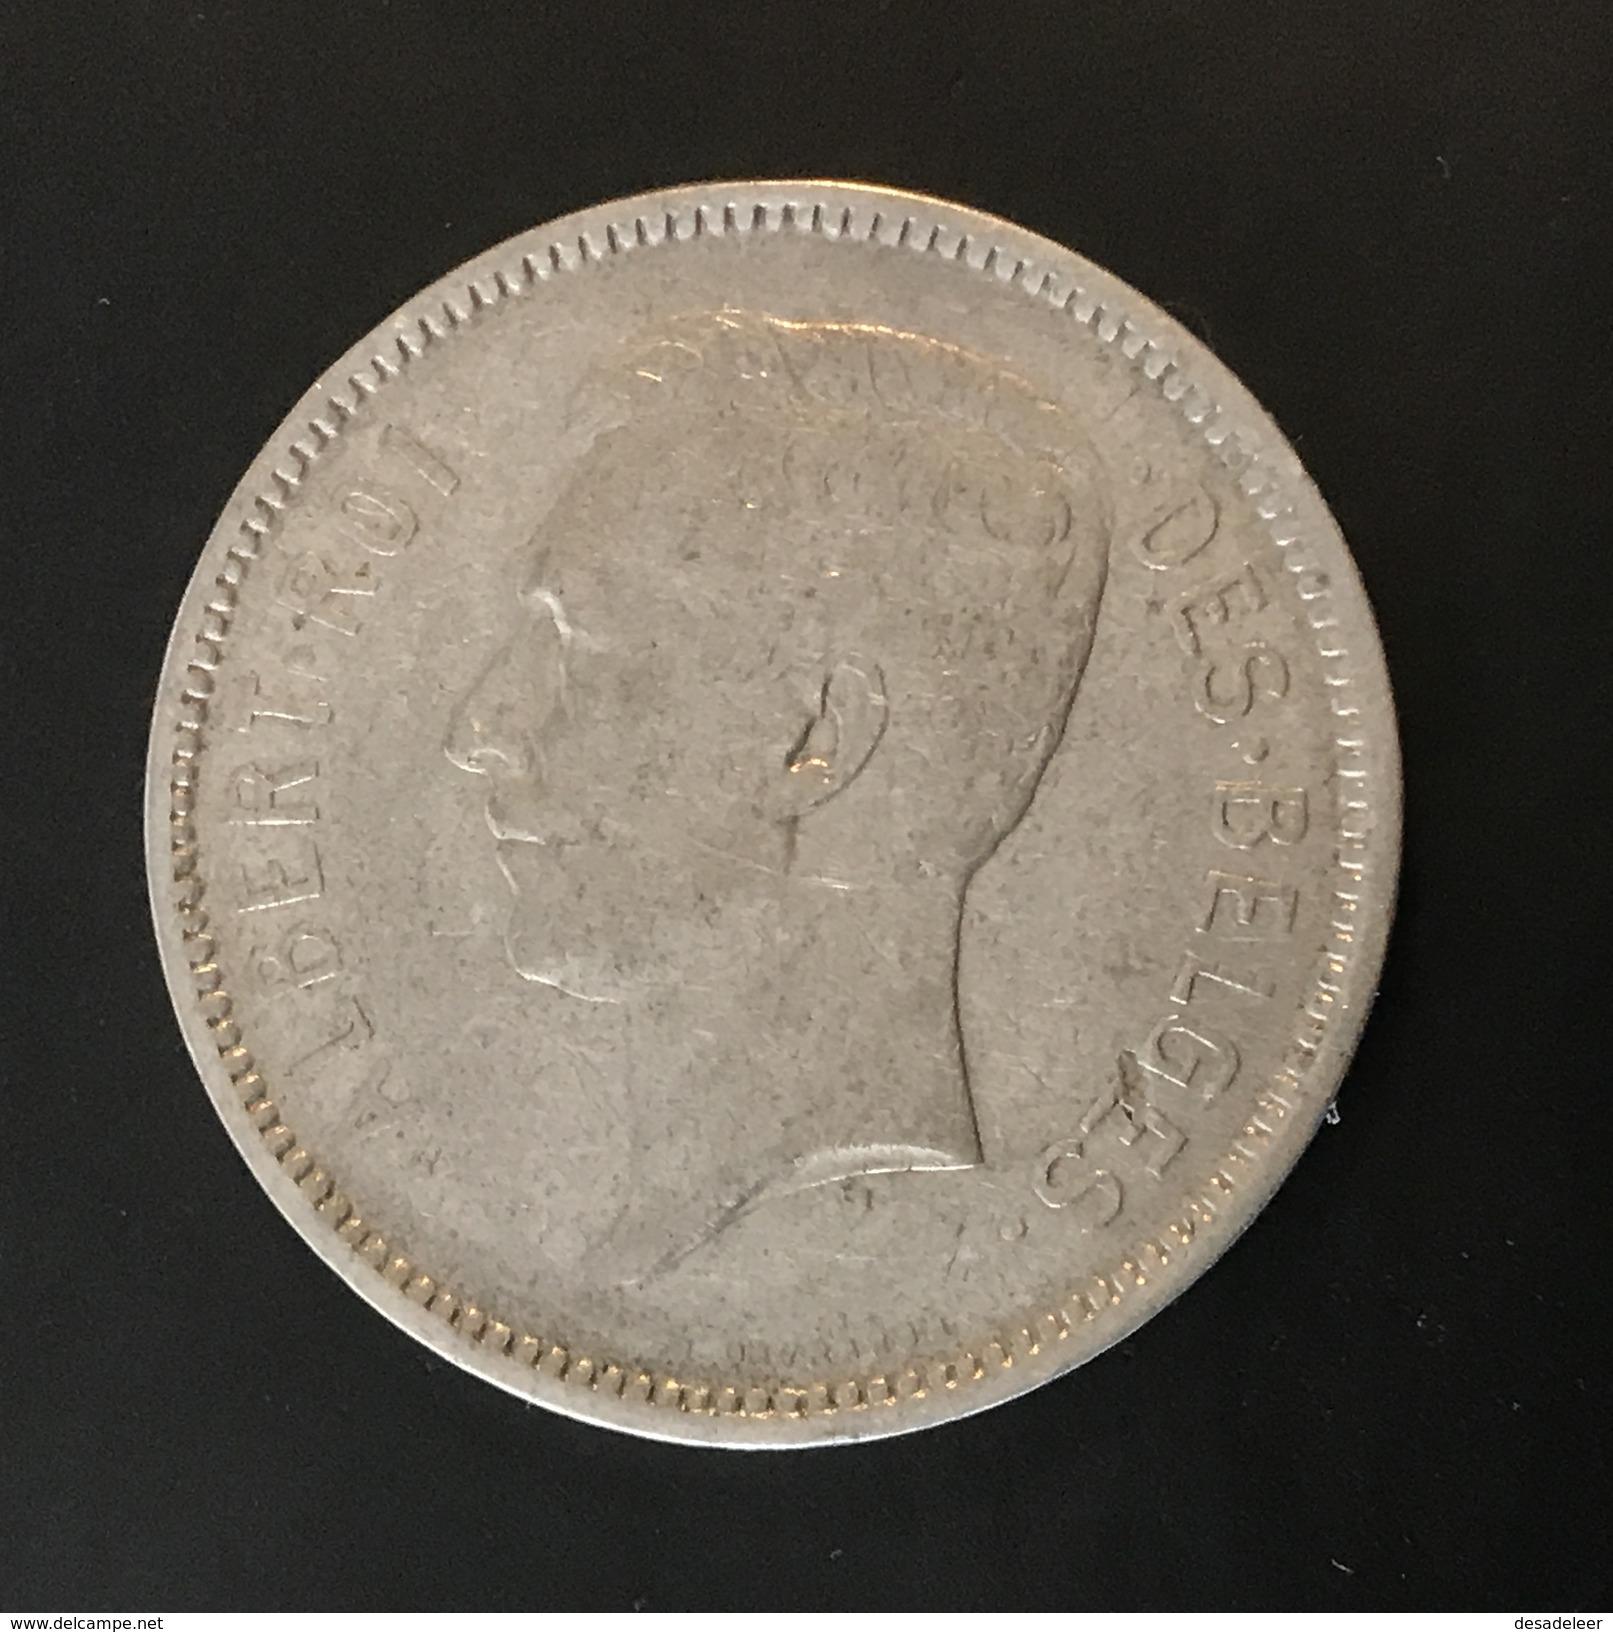 BELGIQUE - BELGIUM - BELGIE - 5 FRANCS 1930 FR - 1909-1934: Albert I